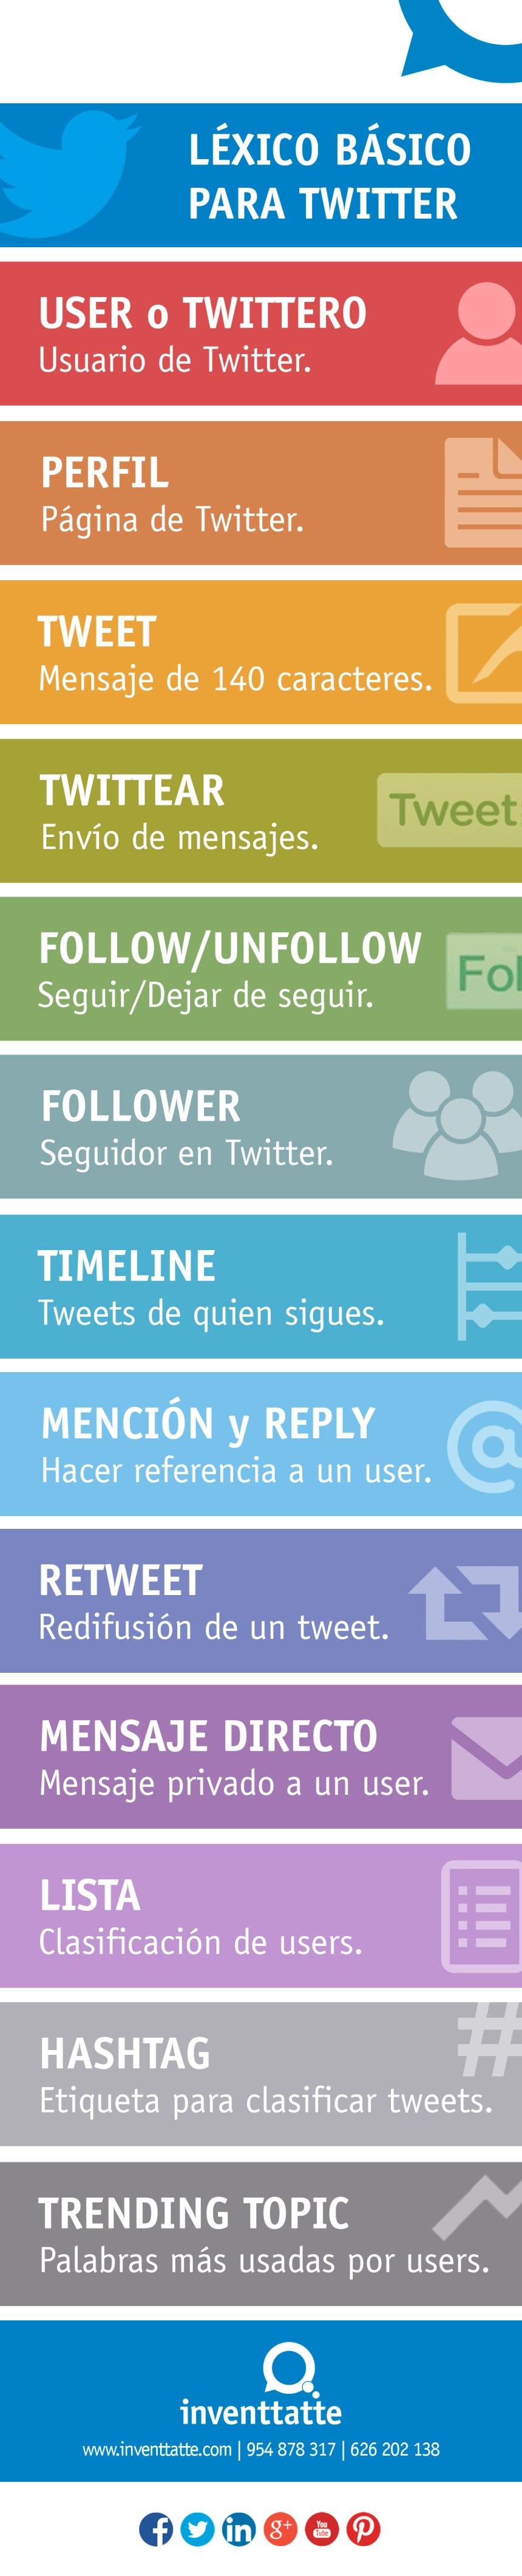 Léxico básico para Twitter